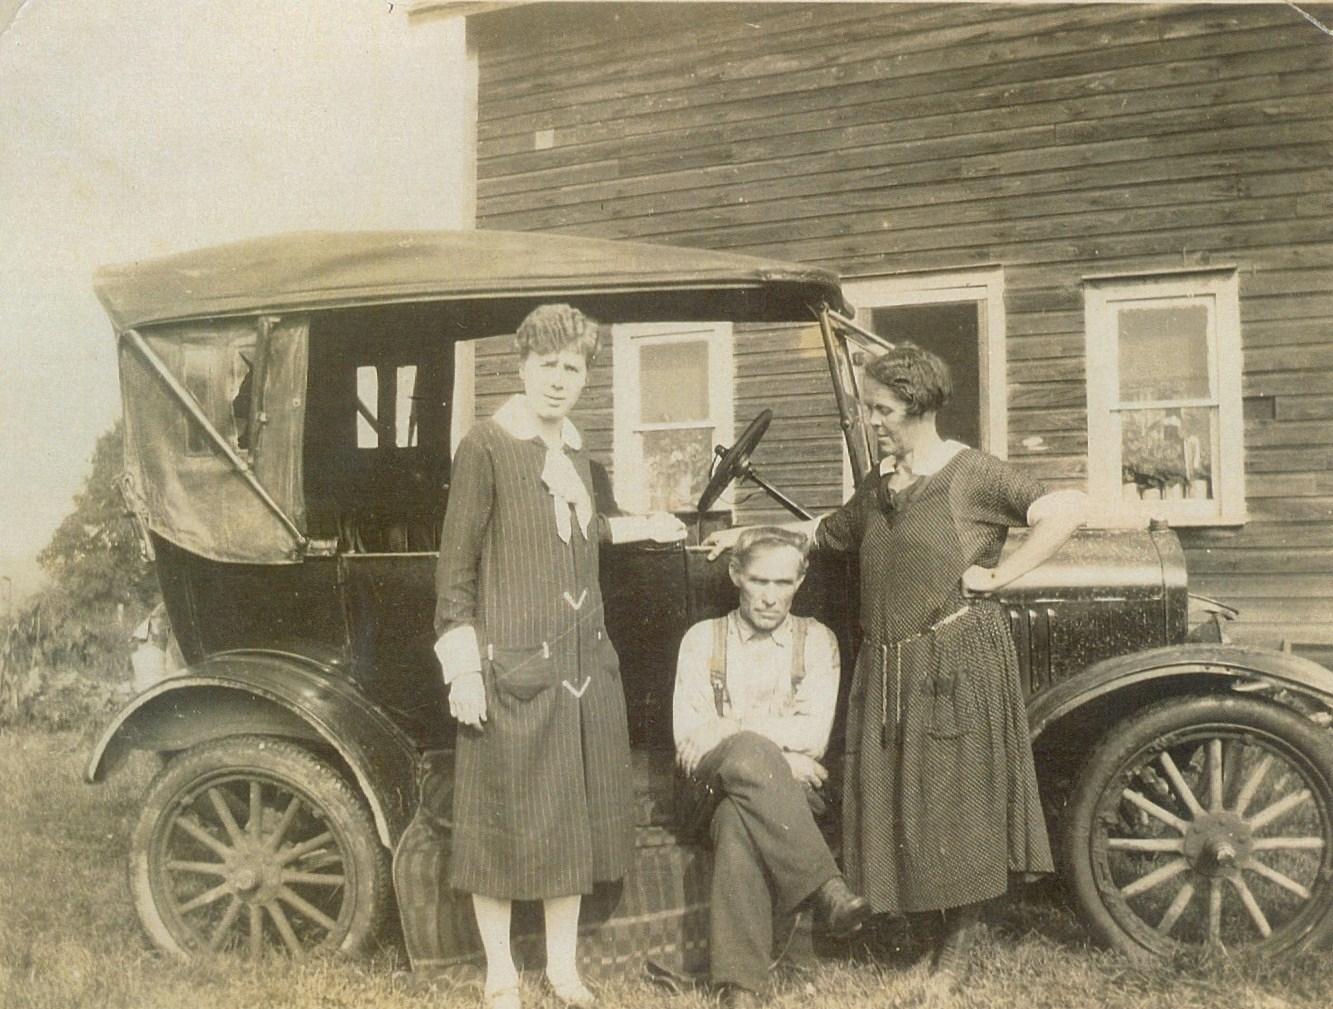 Shanick 1926, teacher Miss Fry, Minnie Revoy, Ben Revoy